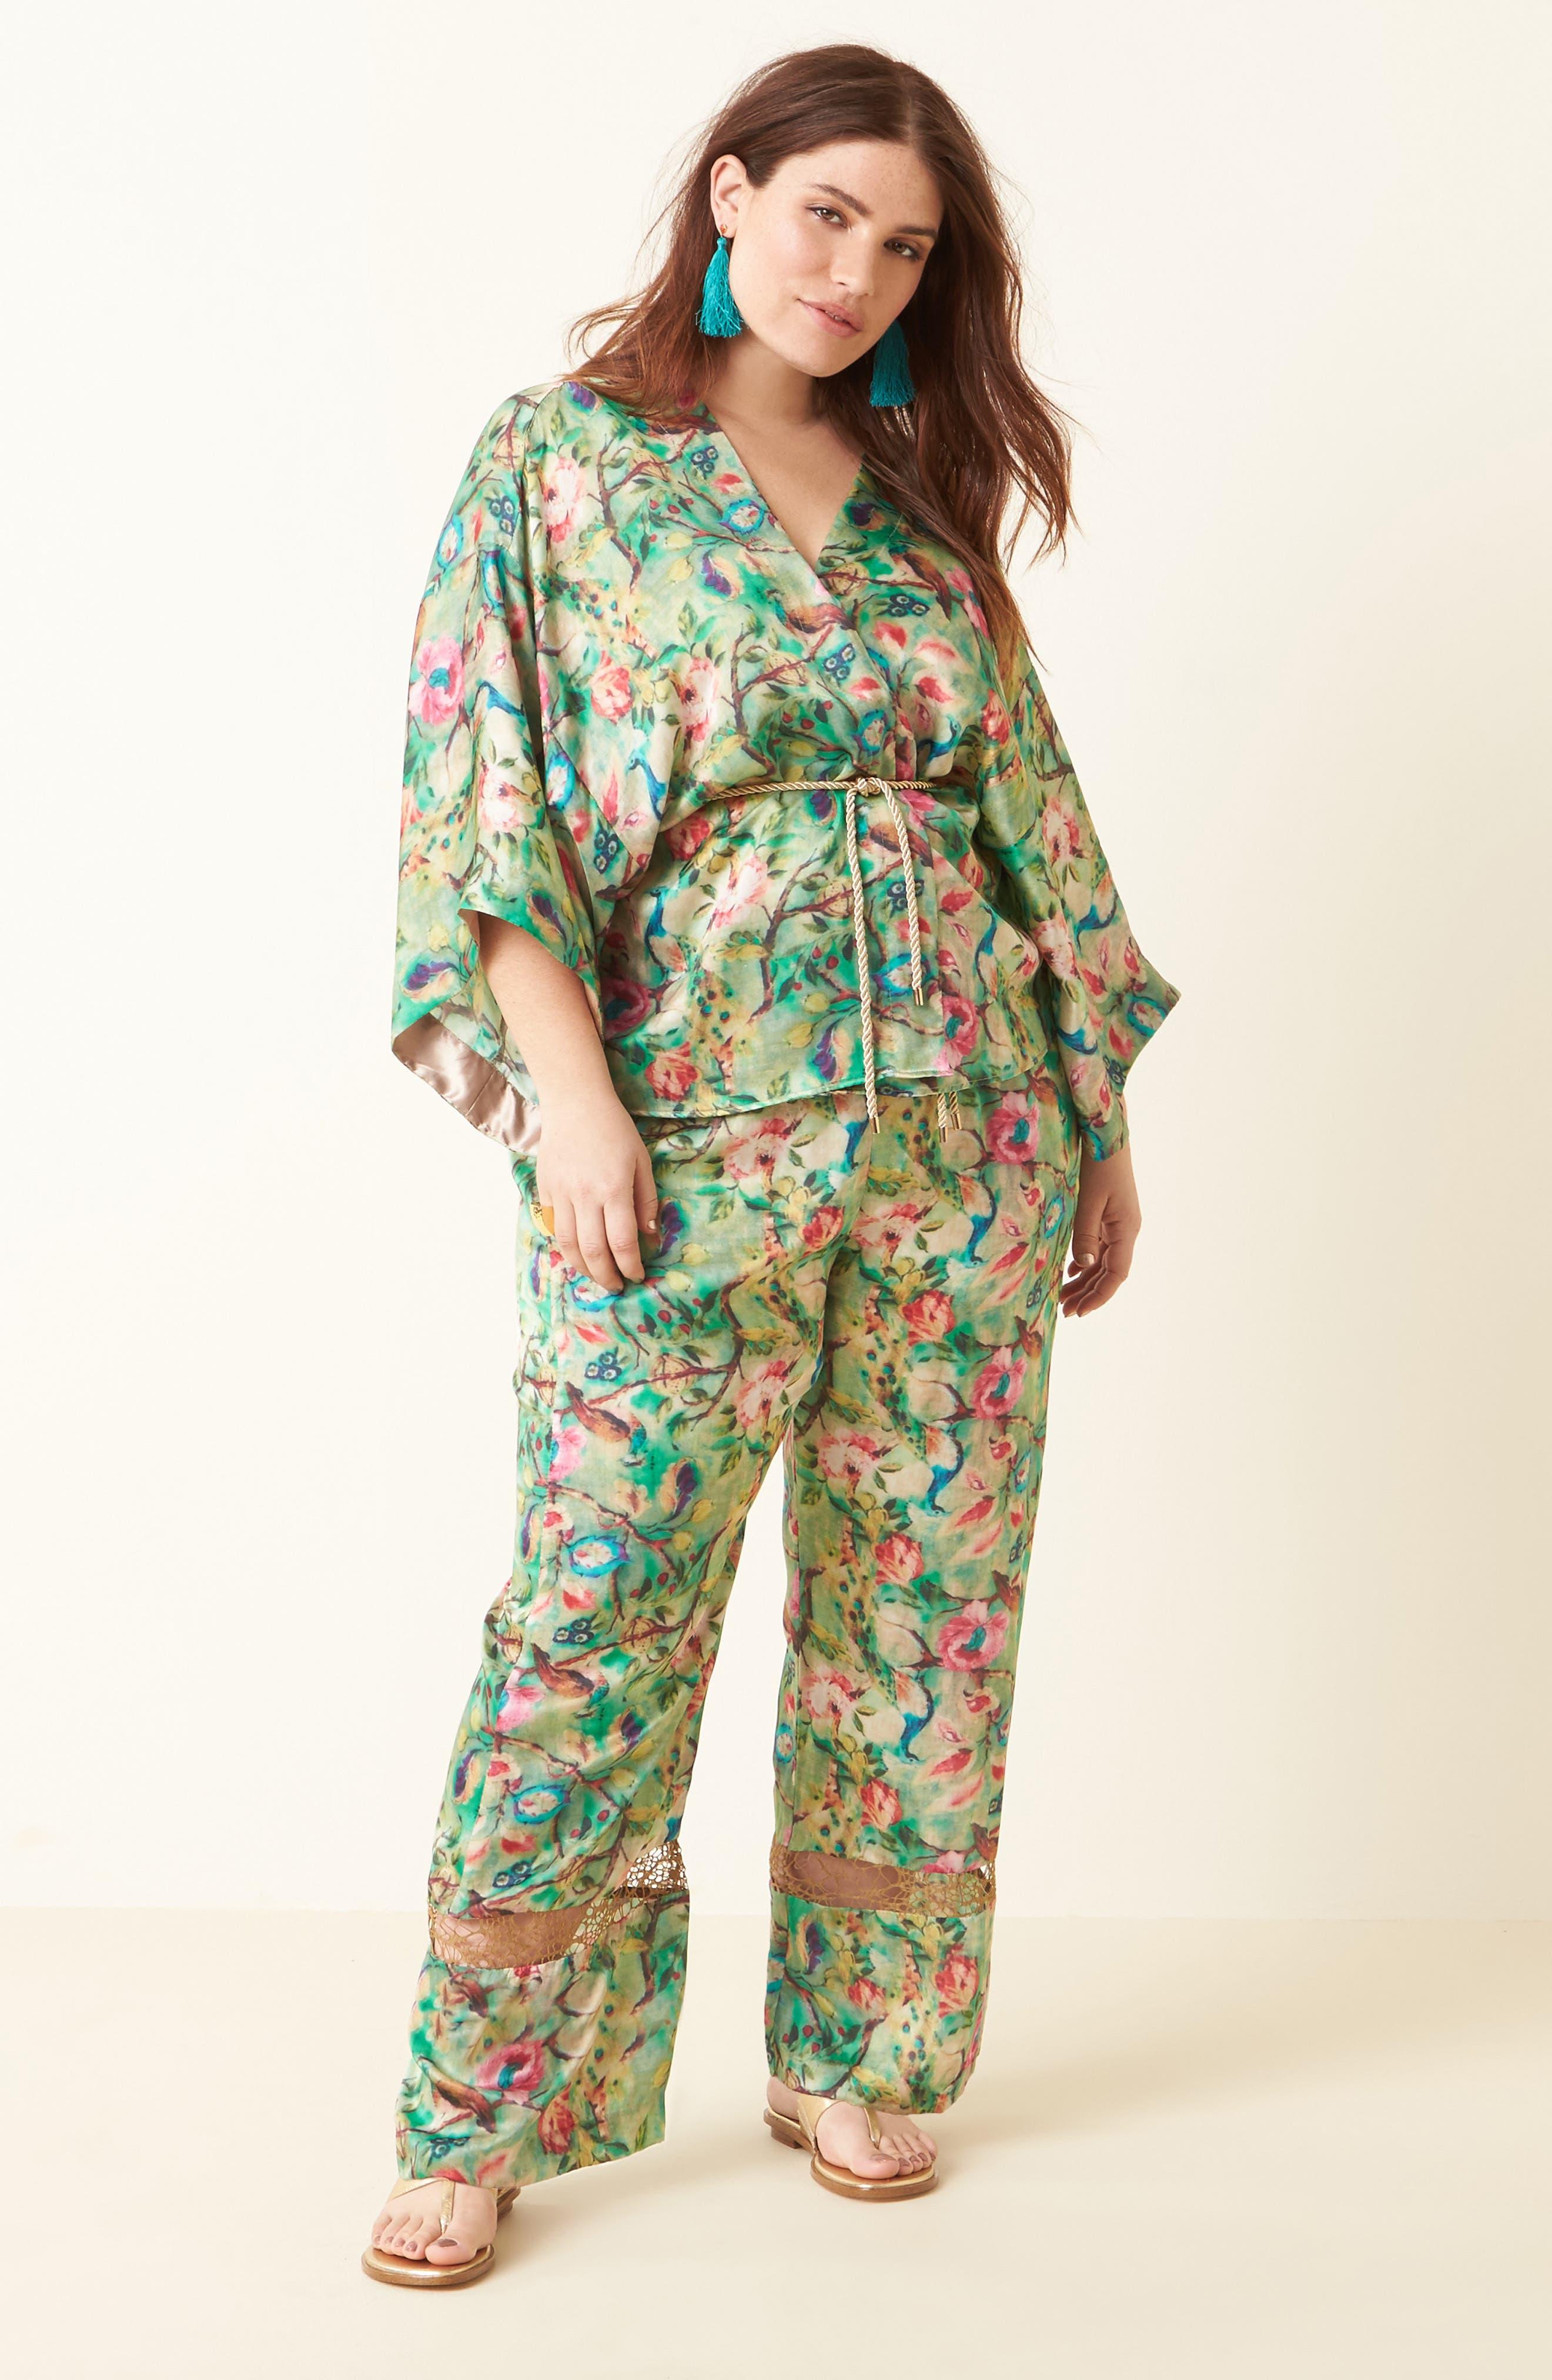 Beleted Floral Komono Jacket,                             Main thumbnail 1, color,                             300